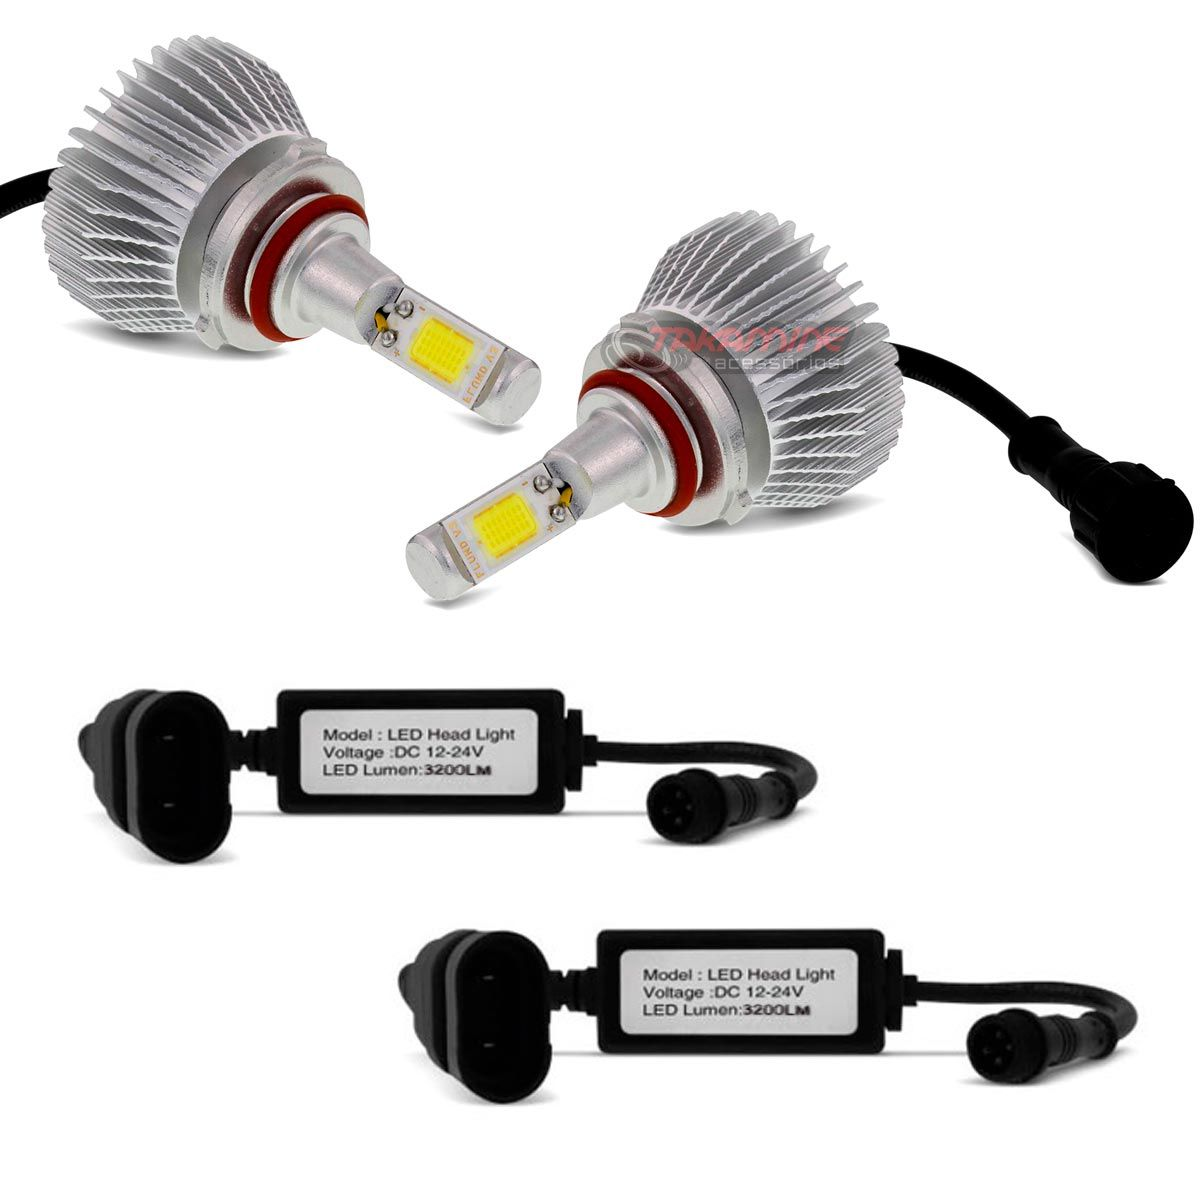 Kit LED 2D Headlight Shocklight tipo xenon Corolla 2012 2013 2014 - farol baixo HB4 35w